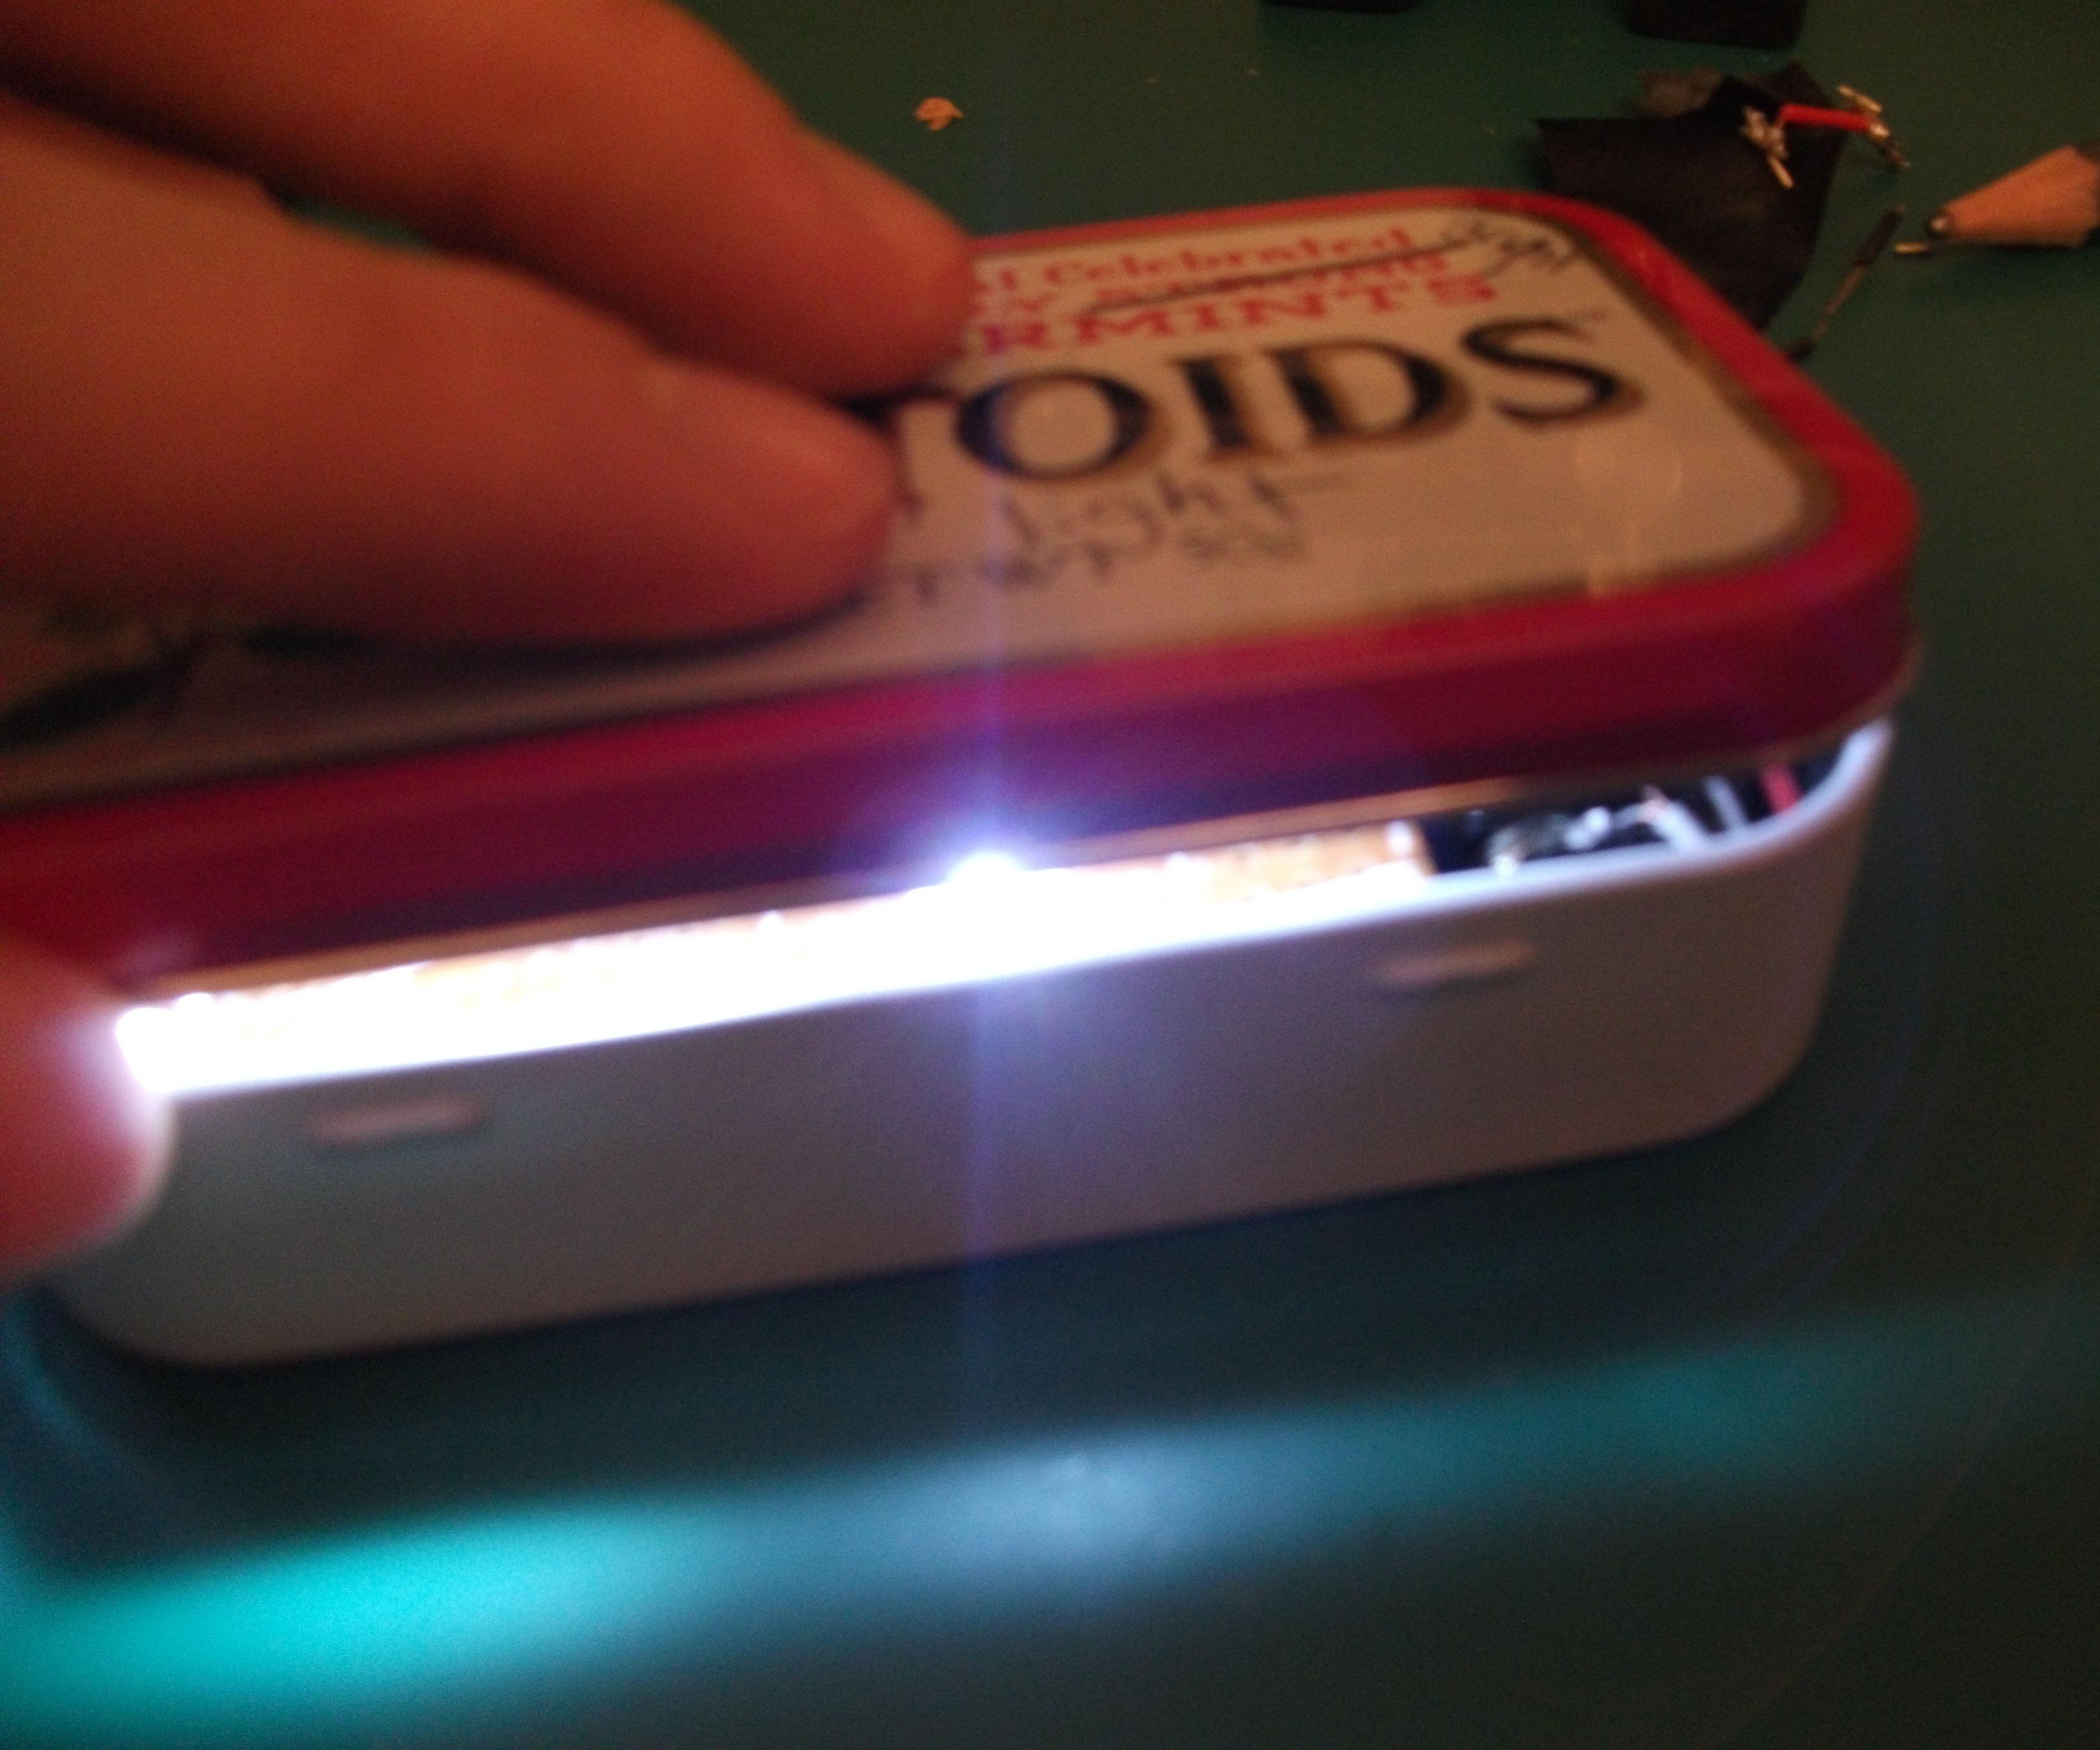 Box o' light - pocket emergency or reading light